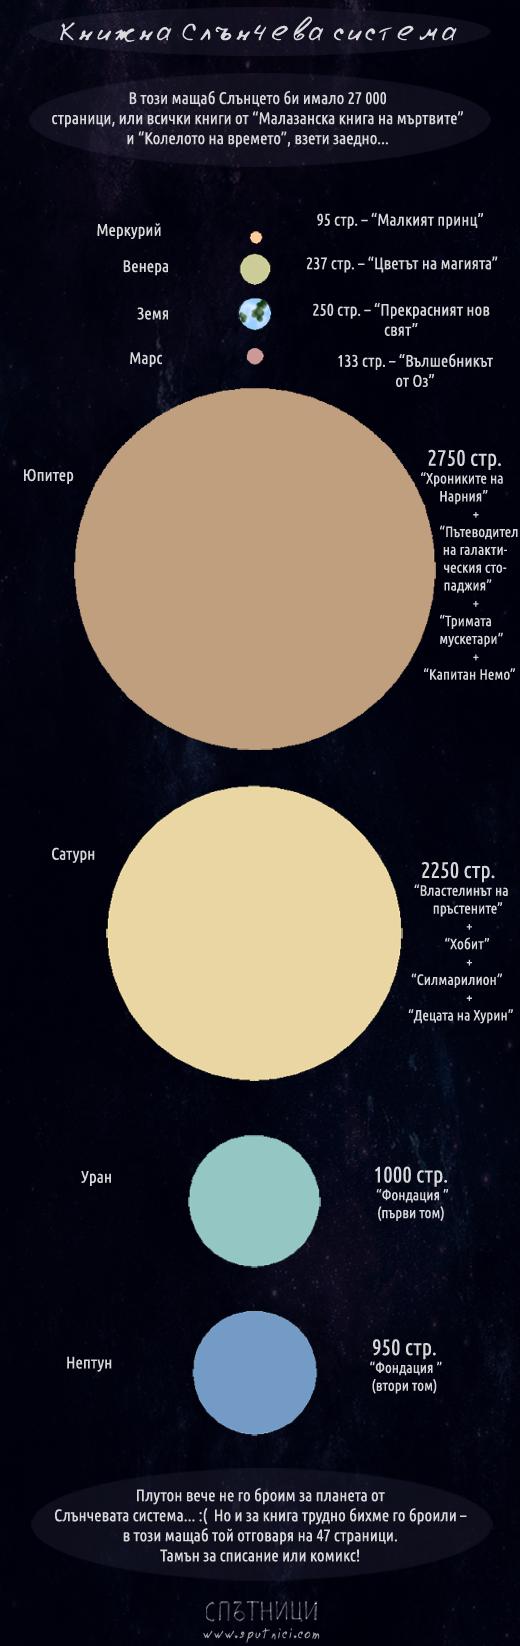 Книжна Слънчева система